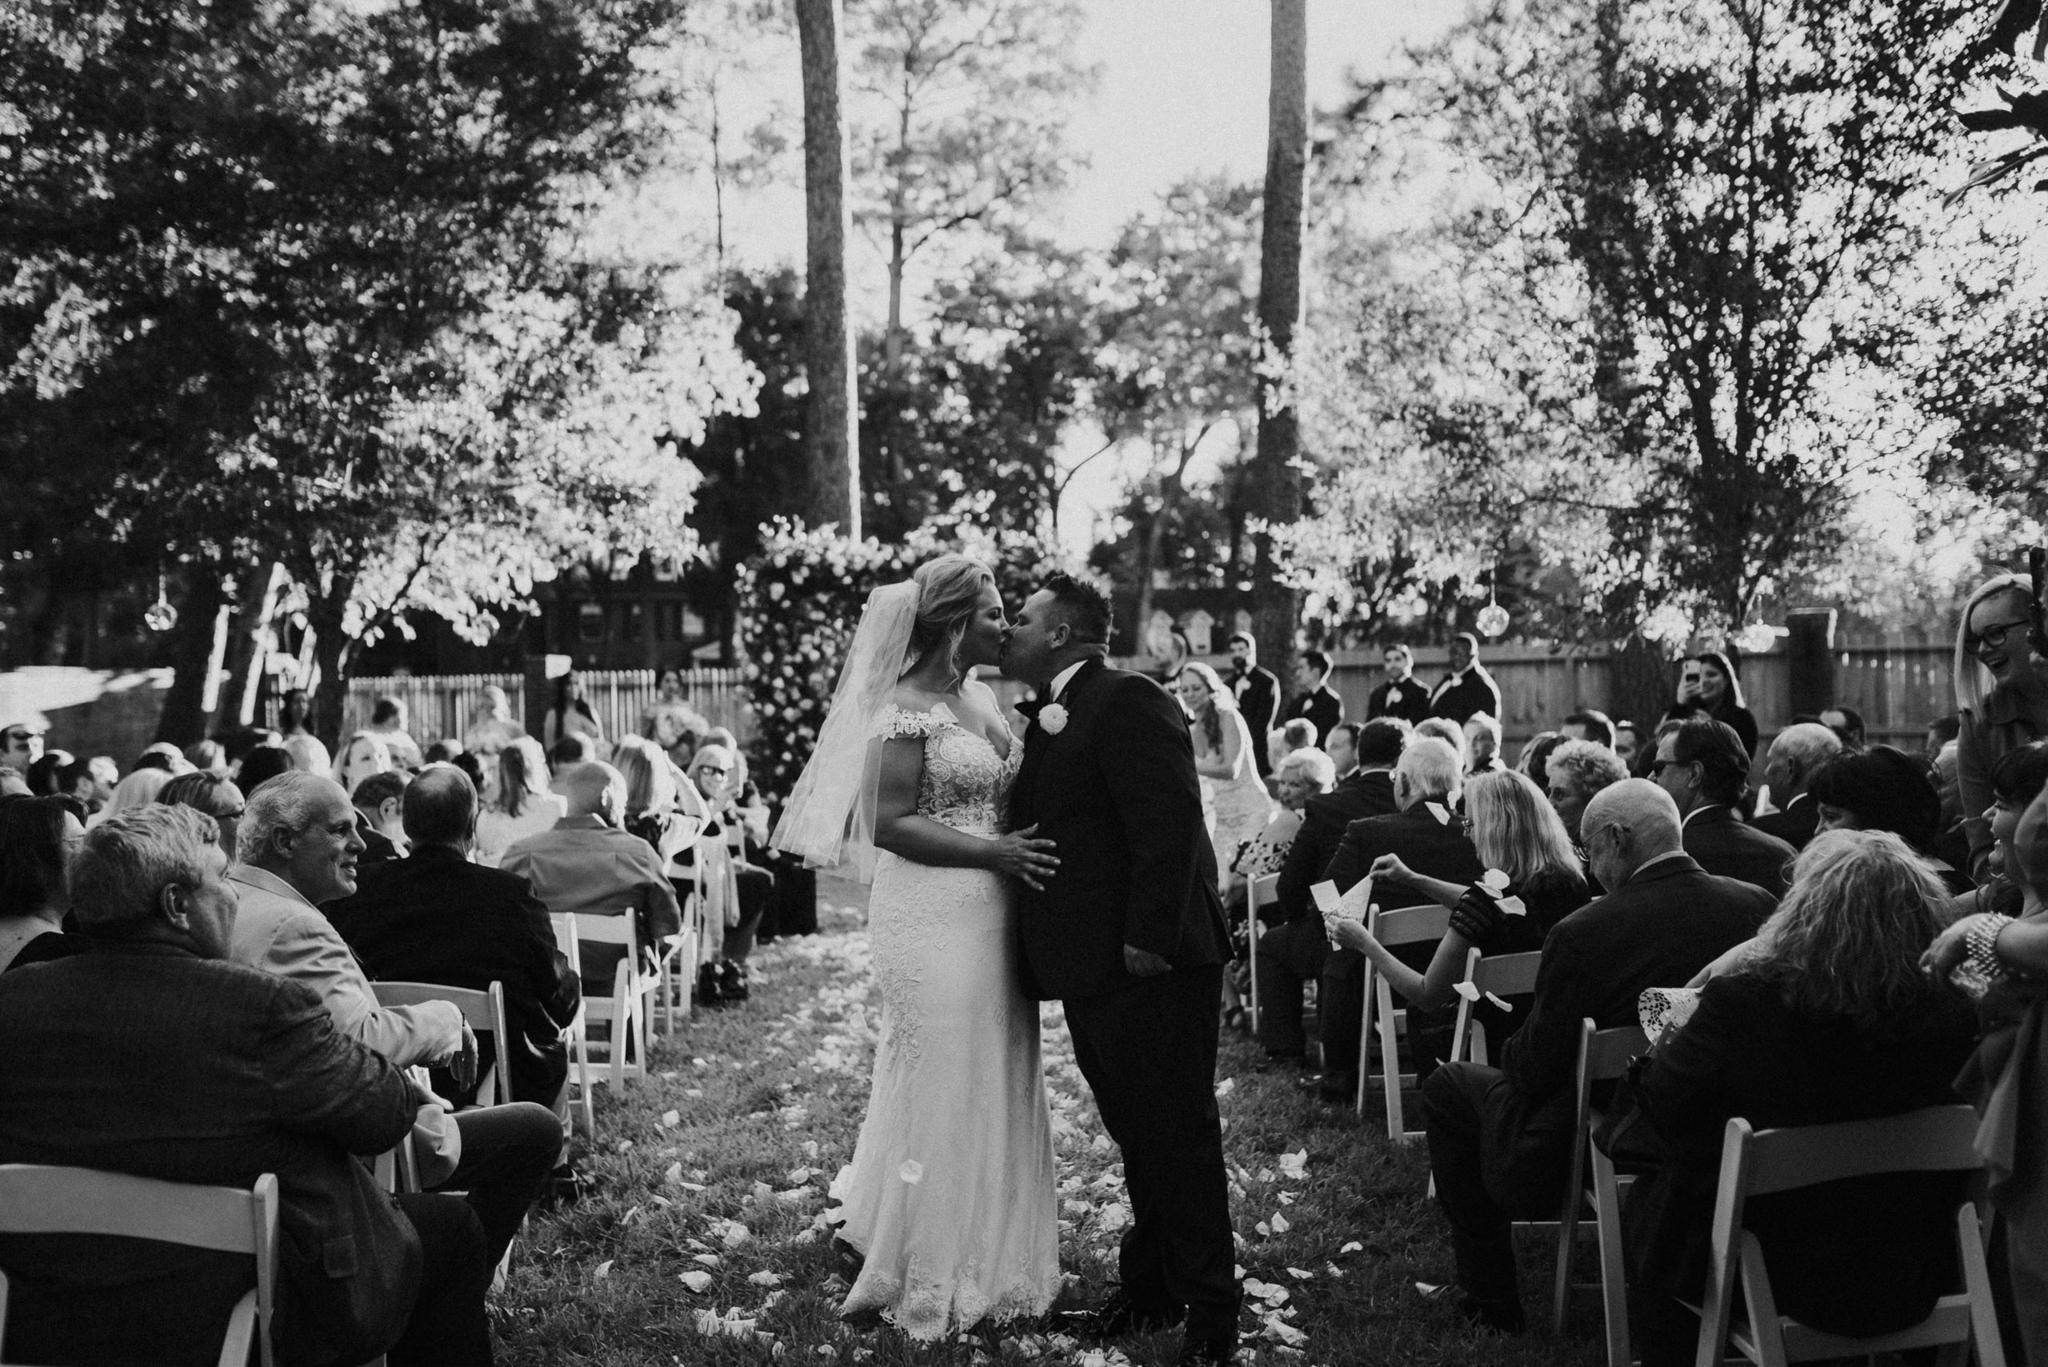 Houston Wedding Photographer-Intimate Texas Backyard Wedding- Houston Wedding Photographer -Kristen Giles Photography-49.jpg